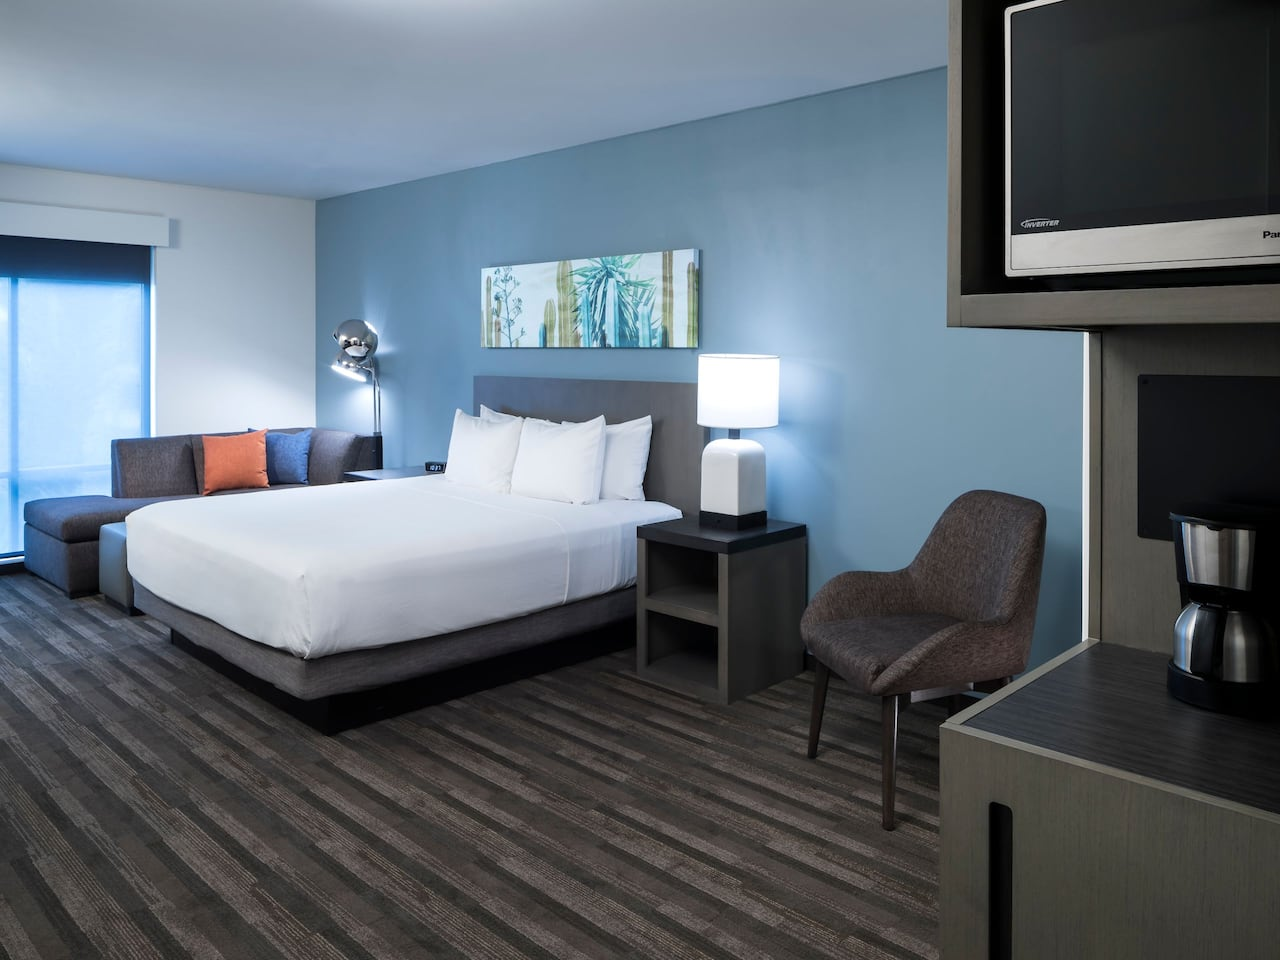 Hyatt House Den Guestroom with King Bed